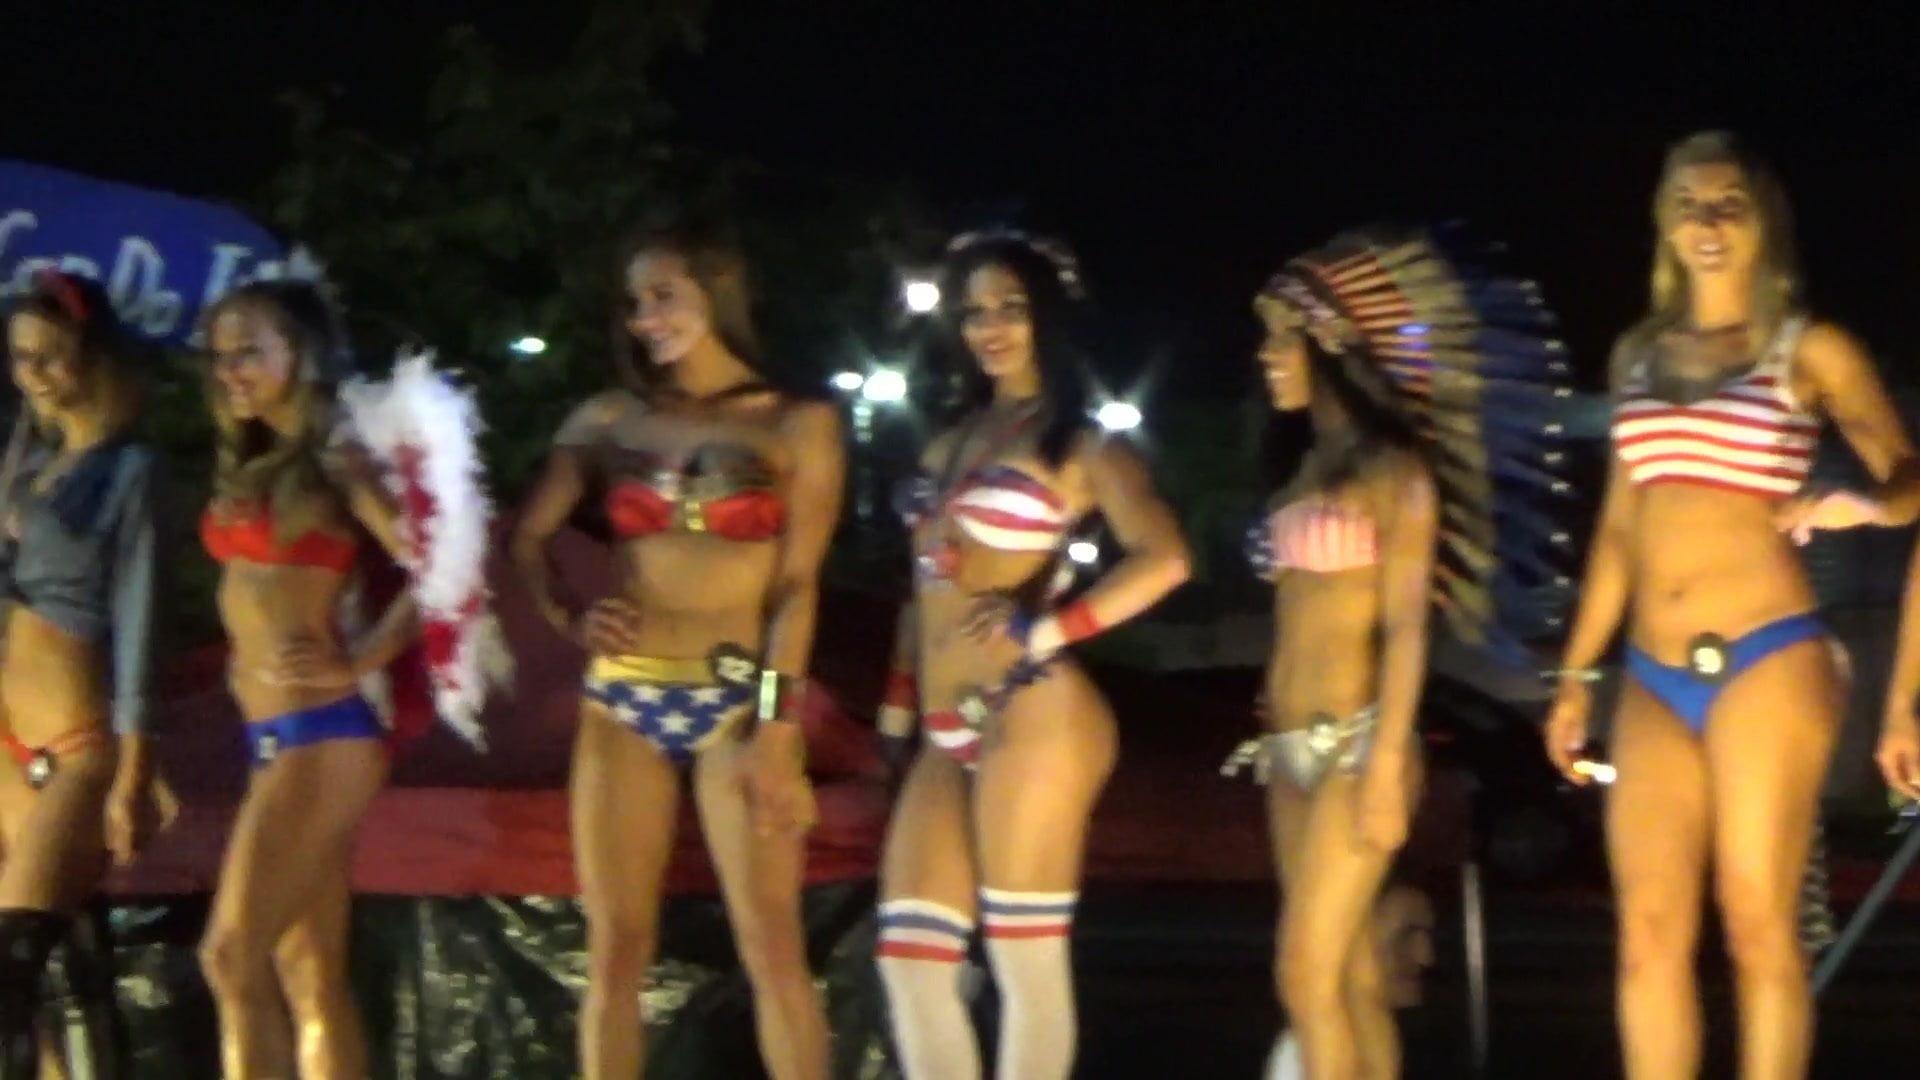 contest 2010 hooter girl bikini